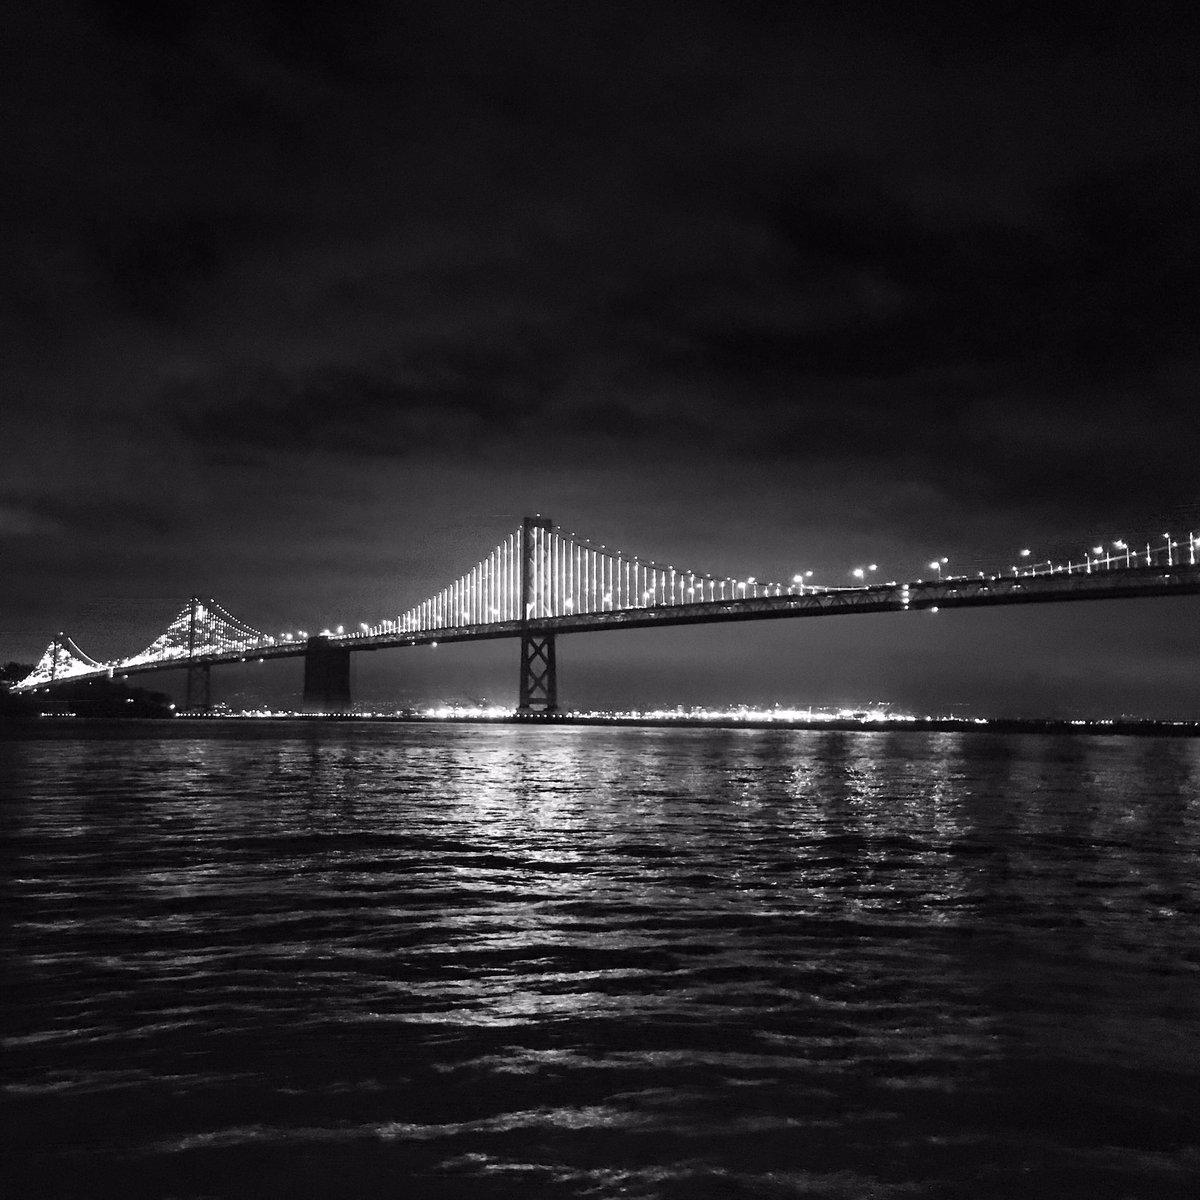 Night Lights  • #bayarea #sf #sfbayarea #sanfrancisco #embarcadero #baybridge #nightscapes #nightlights #nightsinthecity #city #citynights #waterview #bayview #bay #bridge #instagood #weekend #blackandwhitepic.twitter.com/cwG0asimuy